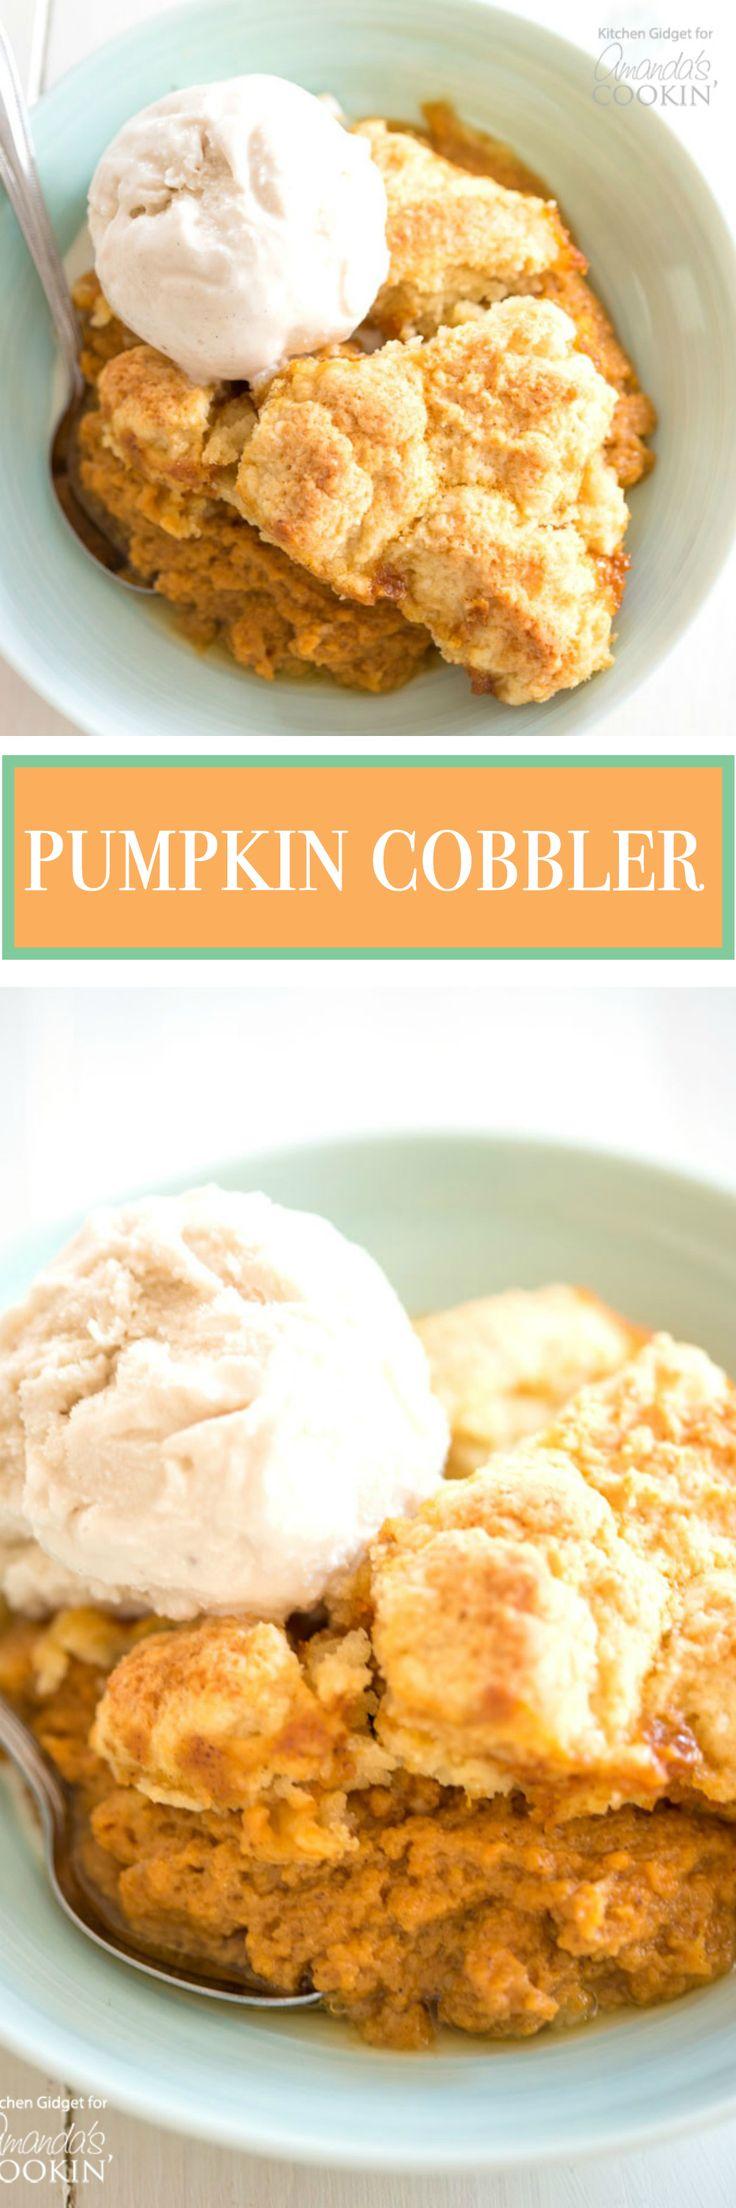 Pumpkin Cobbler: A pumpkin spice custard base with a flaky cobbler topping is the perfect no-fuss dessert for the fall season.